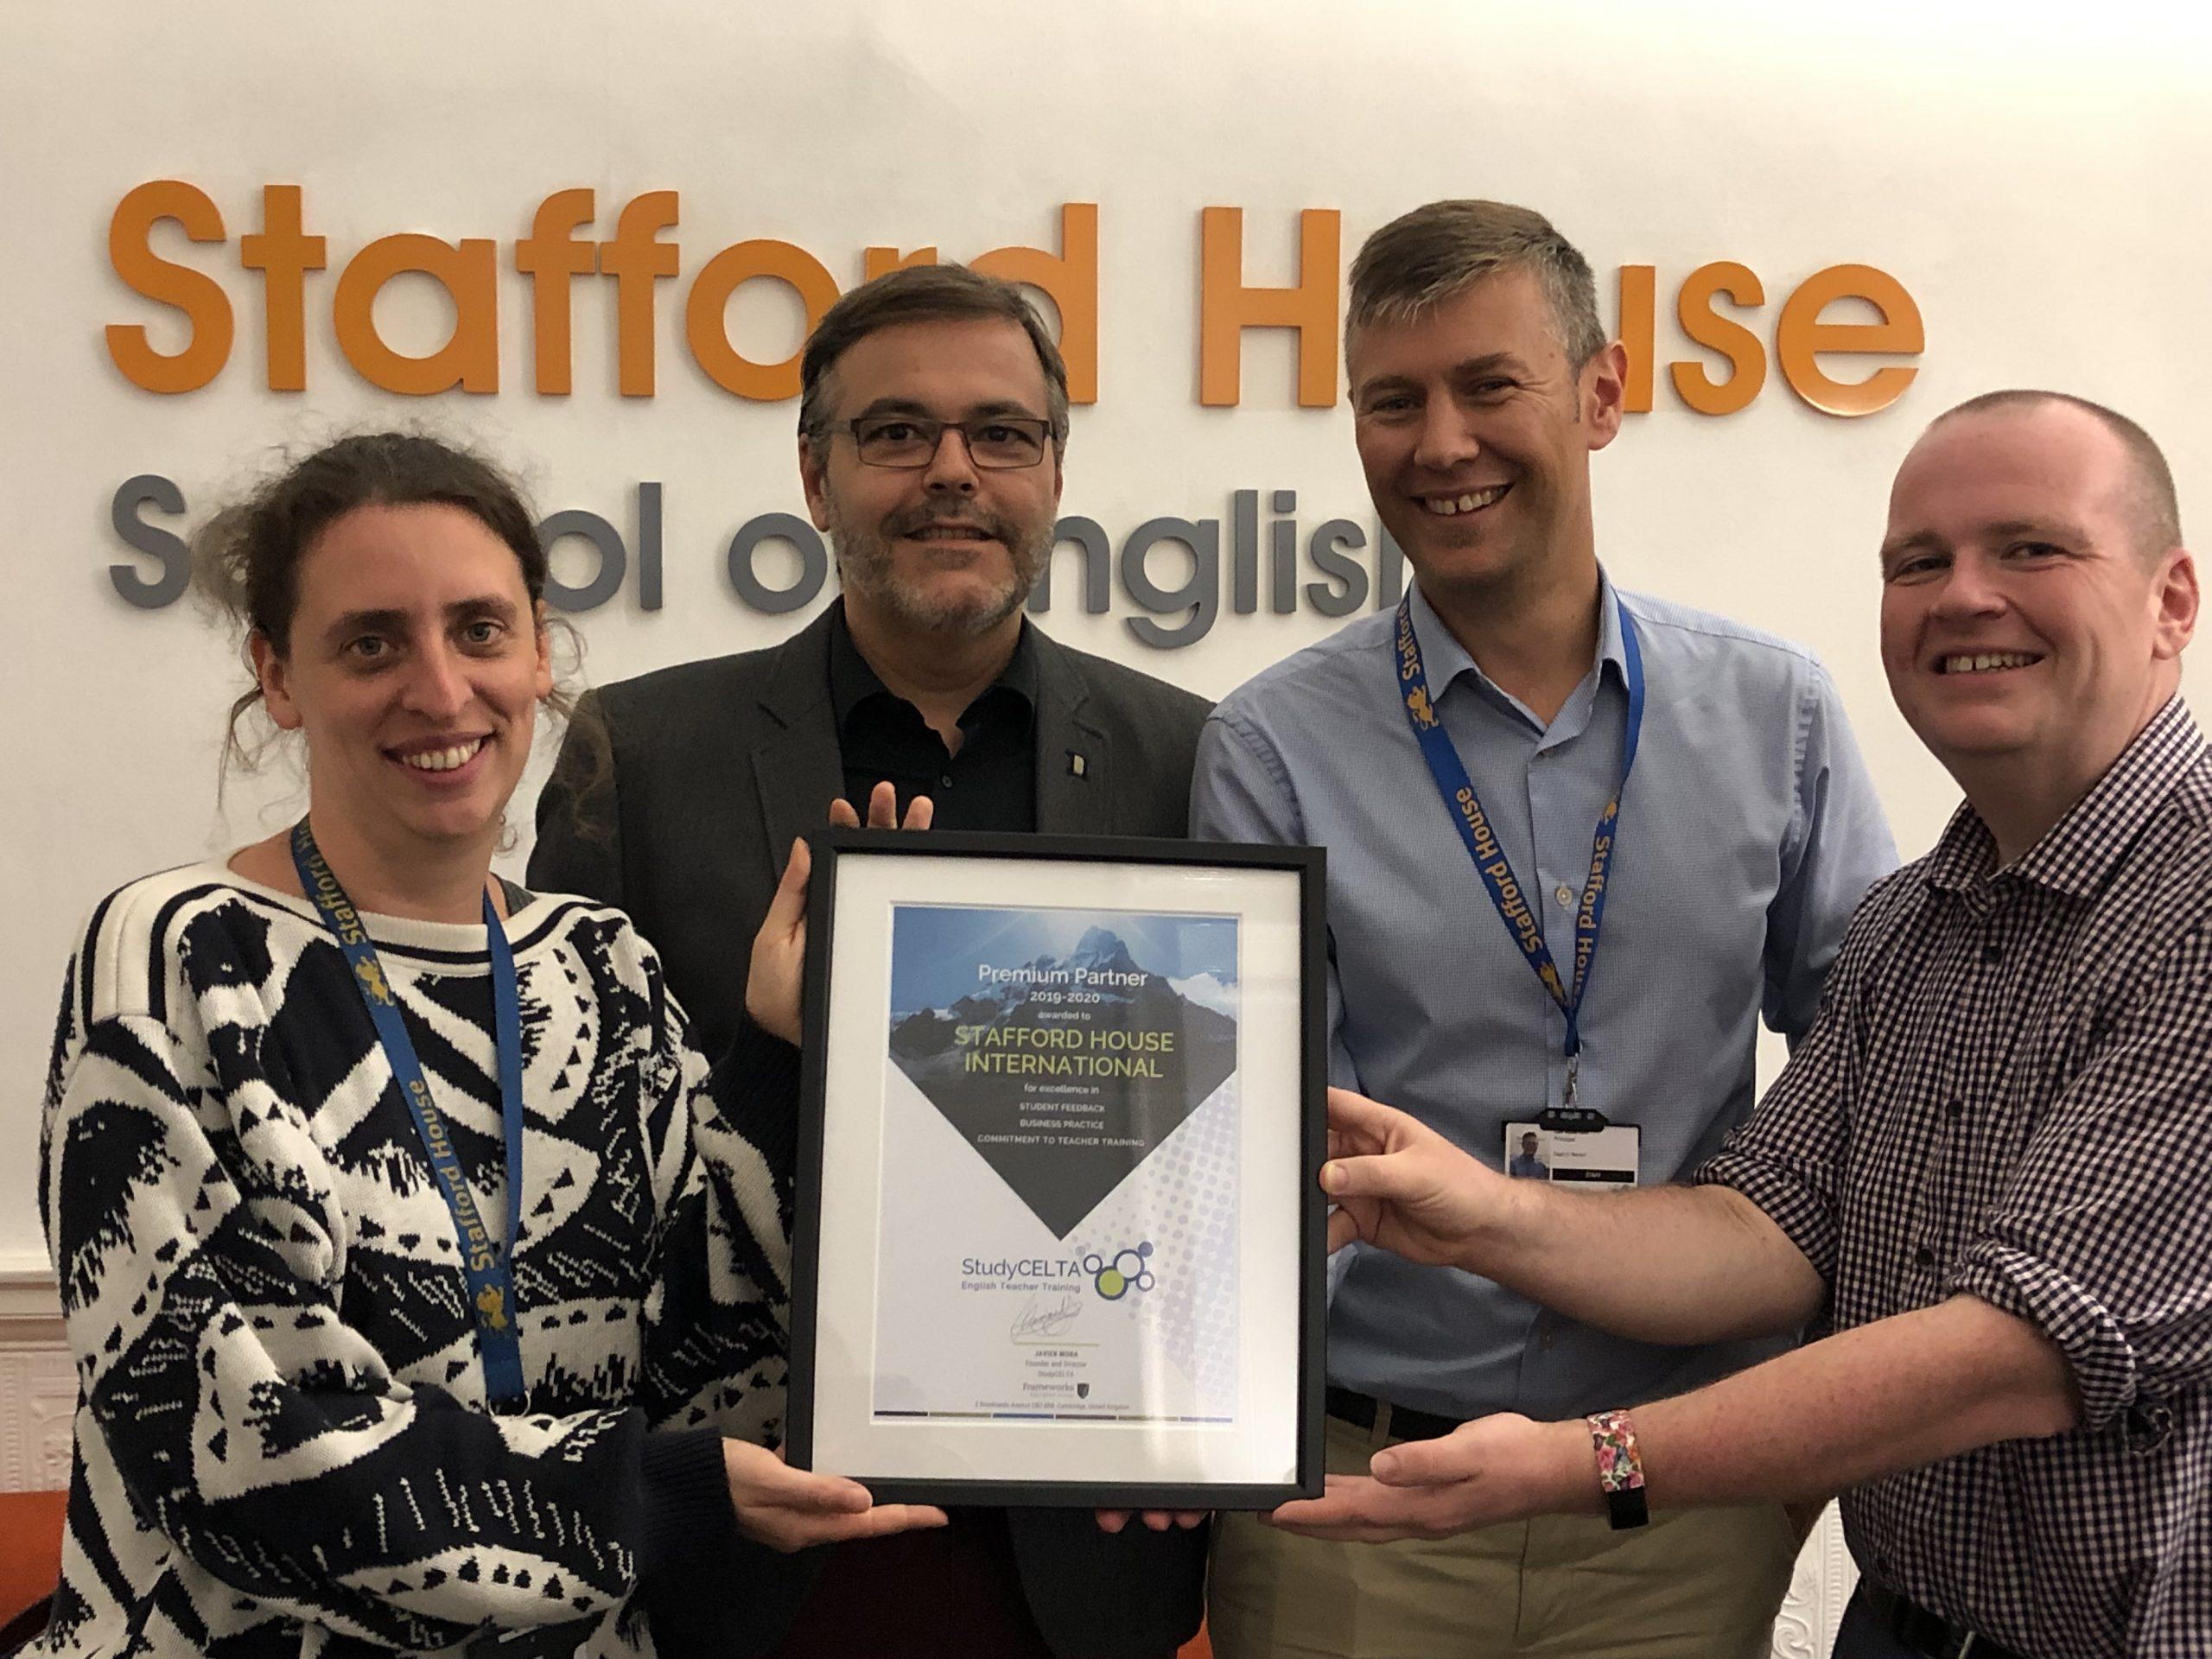 Stafford House Premium Partner Award